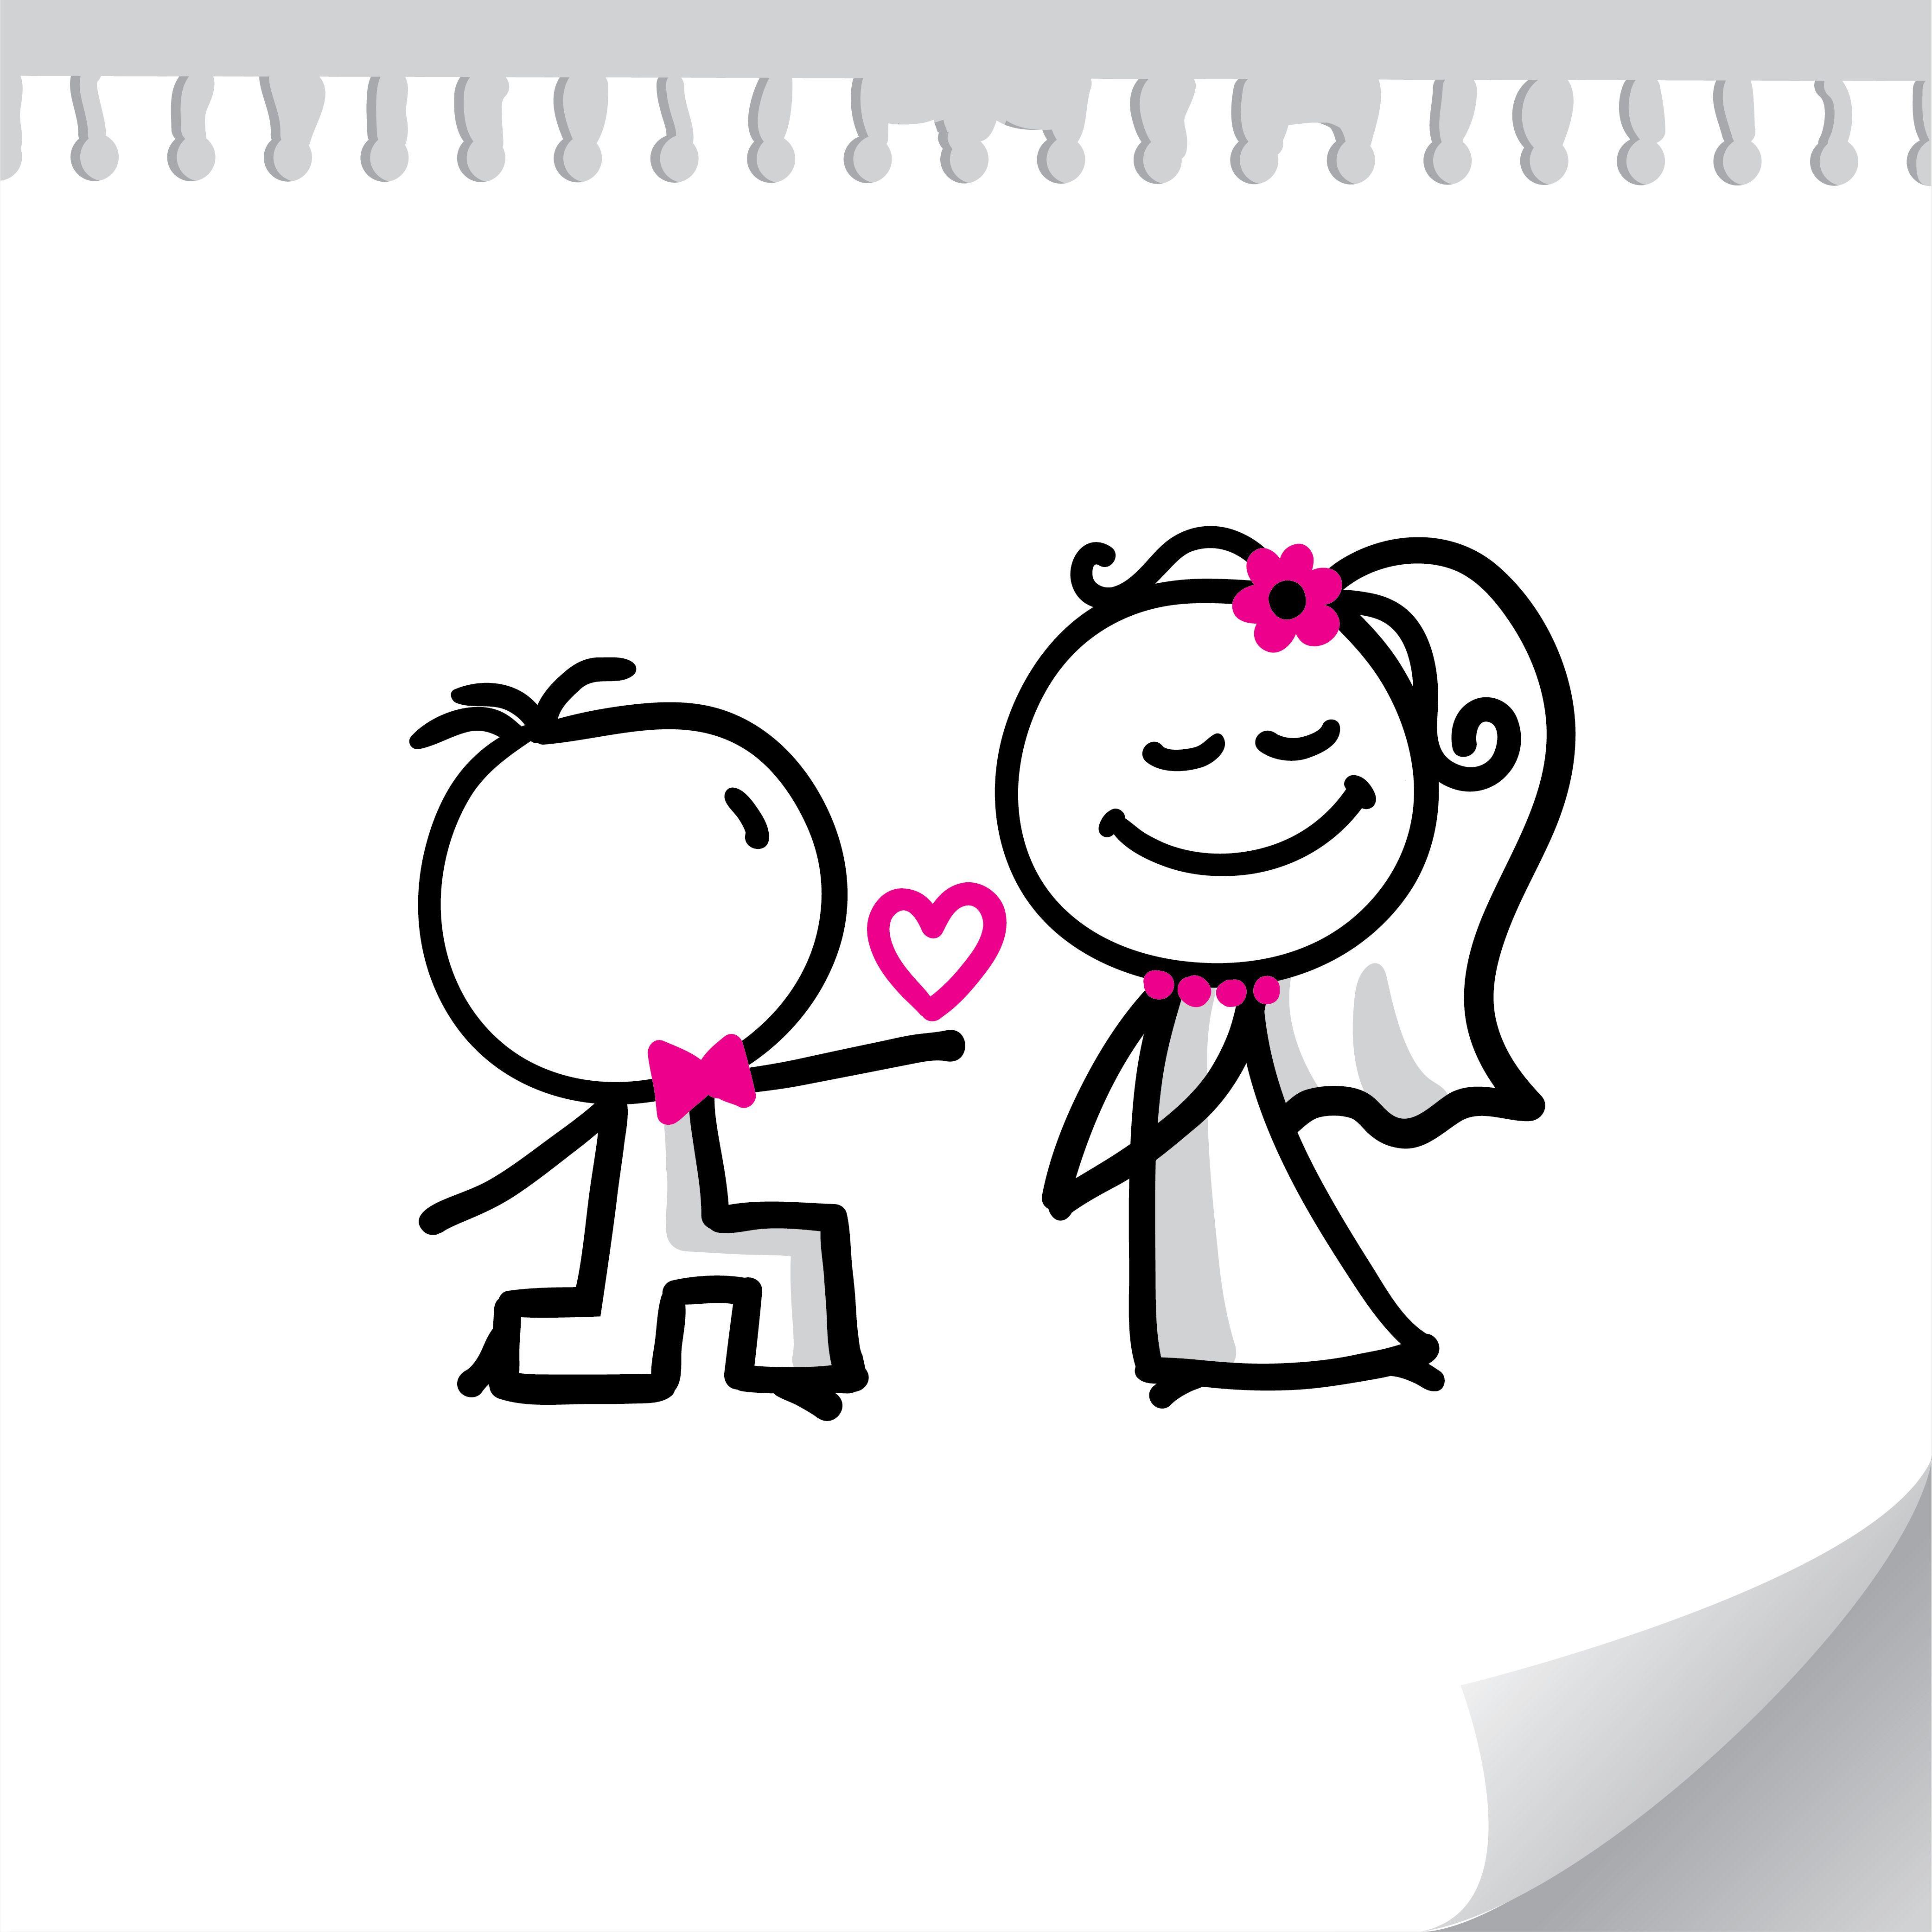 Proposal Wedding Engagement Congratulations Clipart